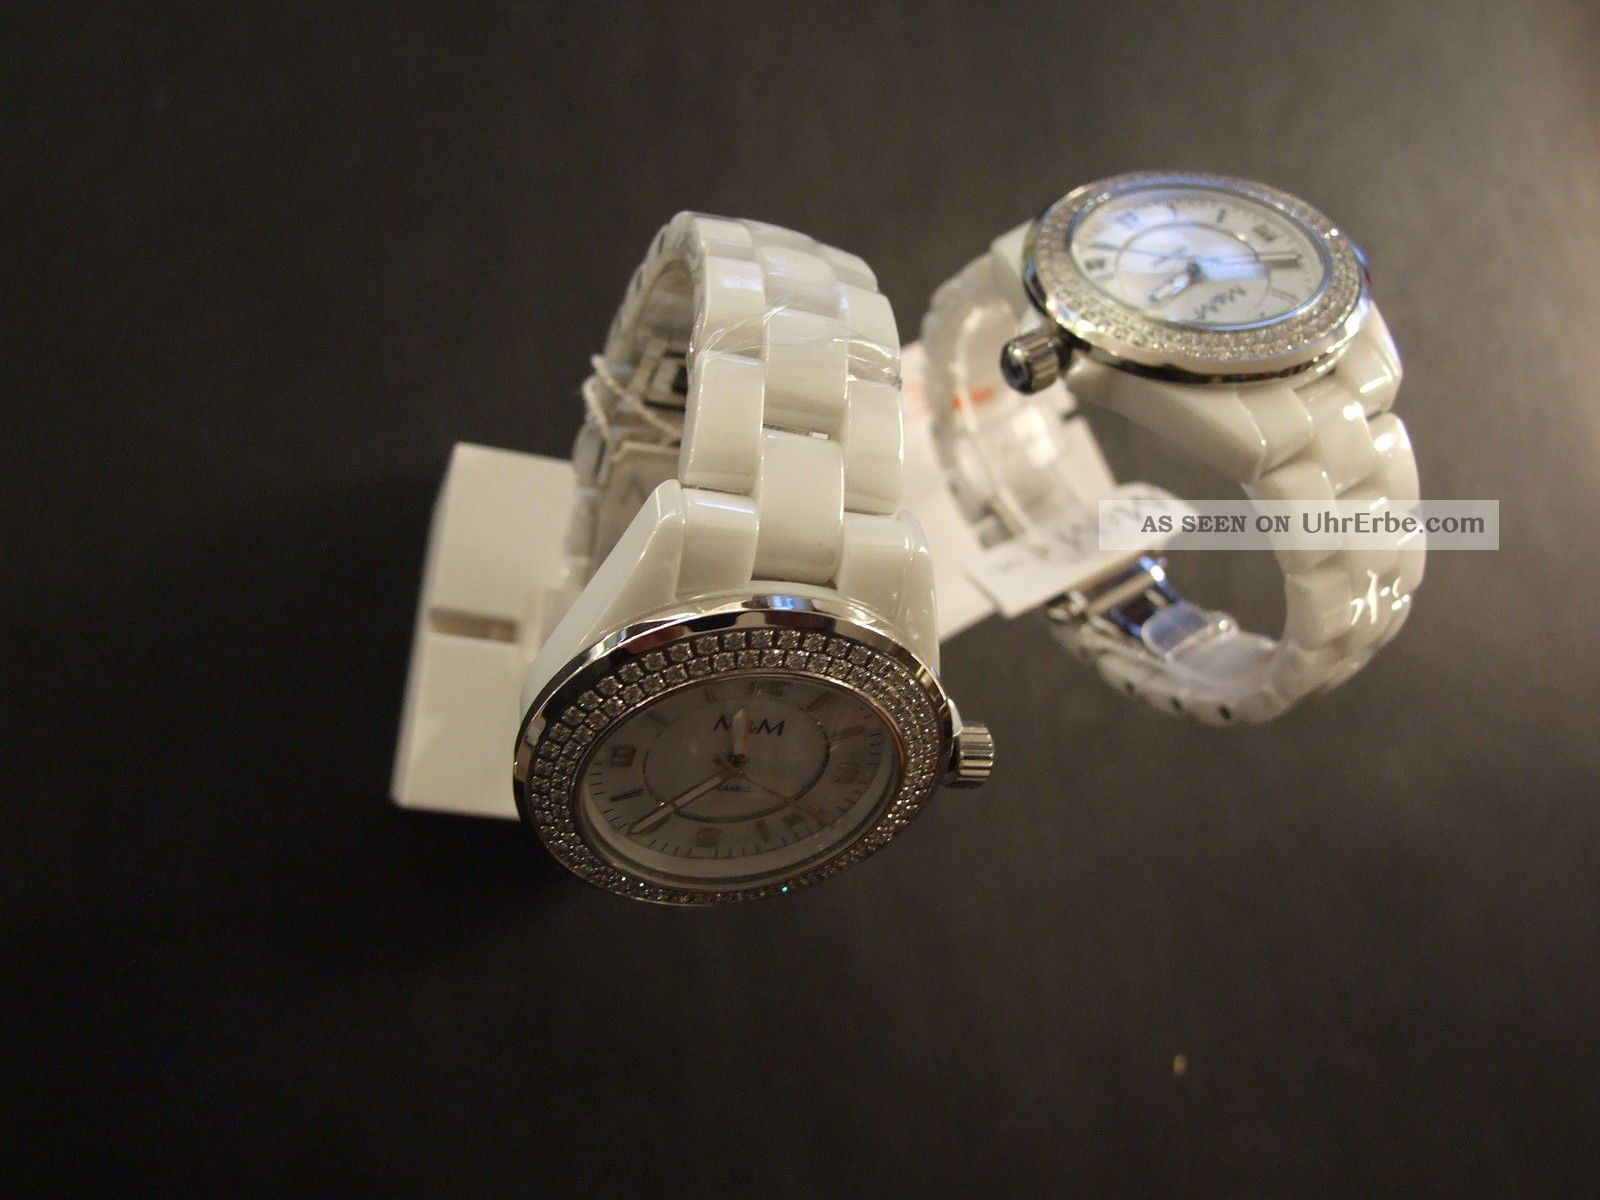 Damenuhr M&m Sports Ceramic Herbst / Winter 2014 Armbanduhren Bild